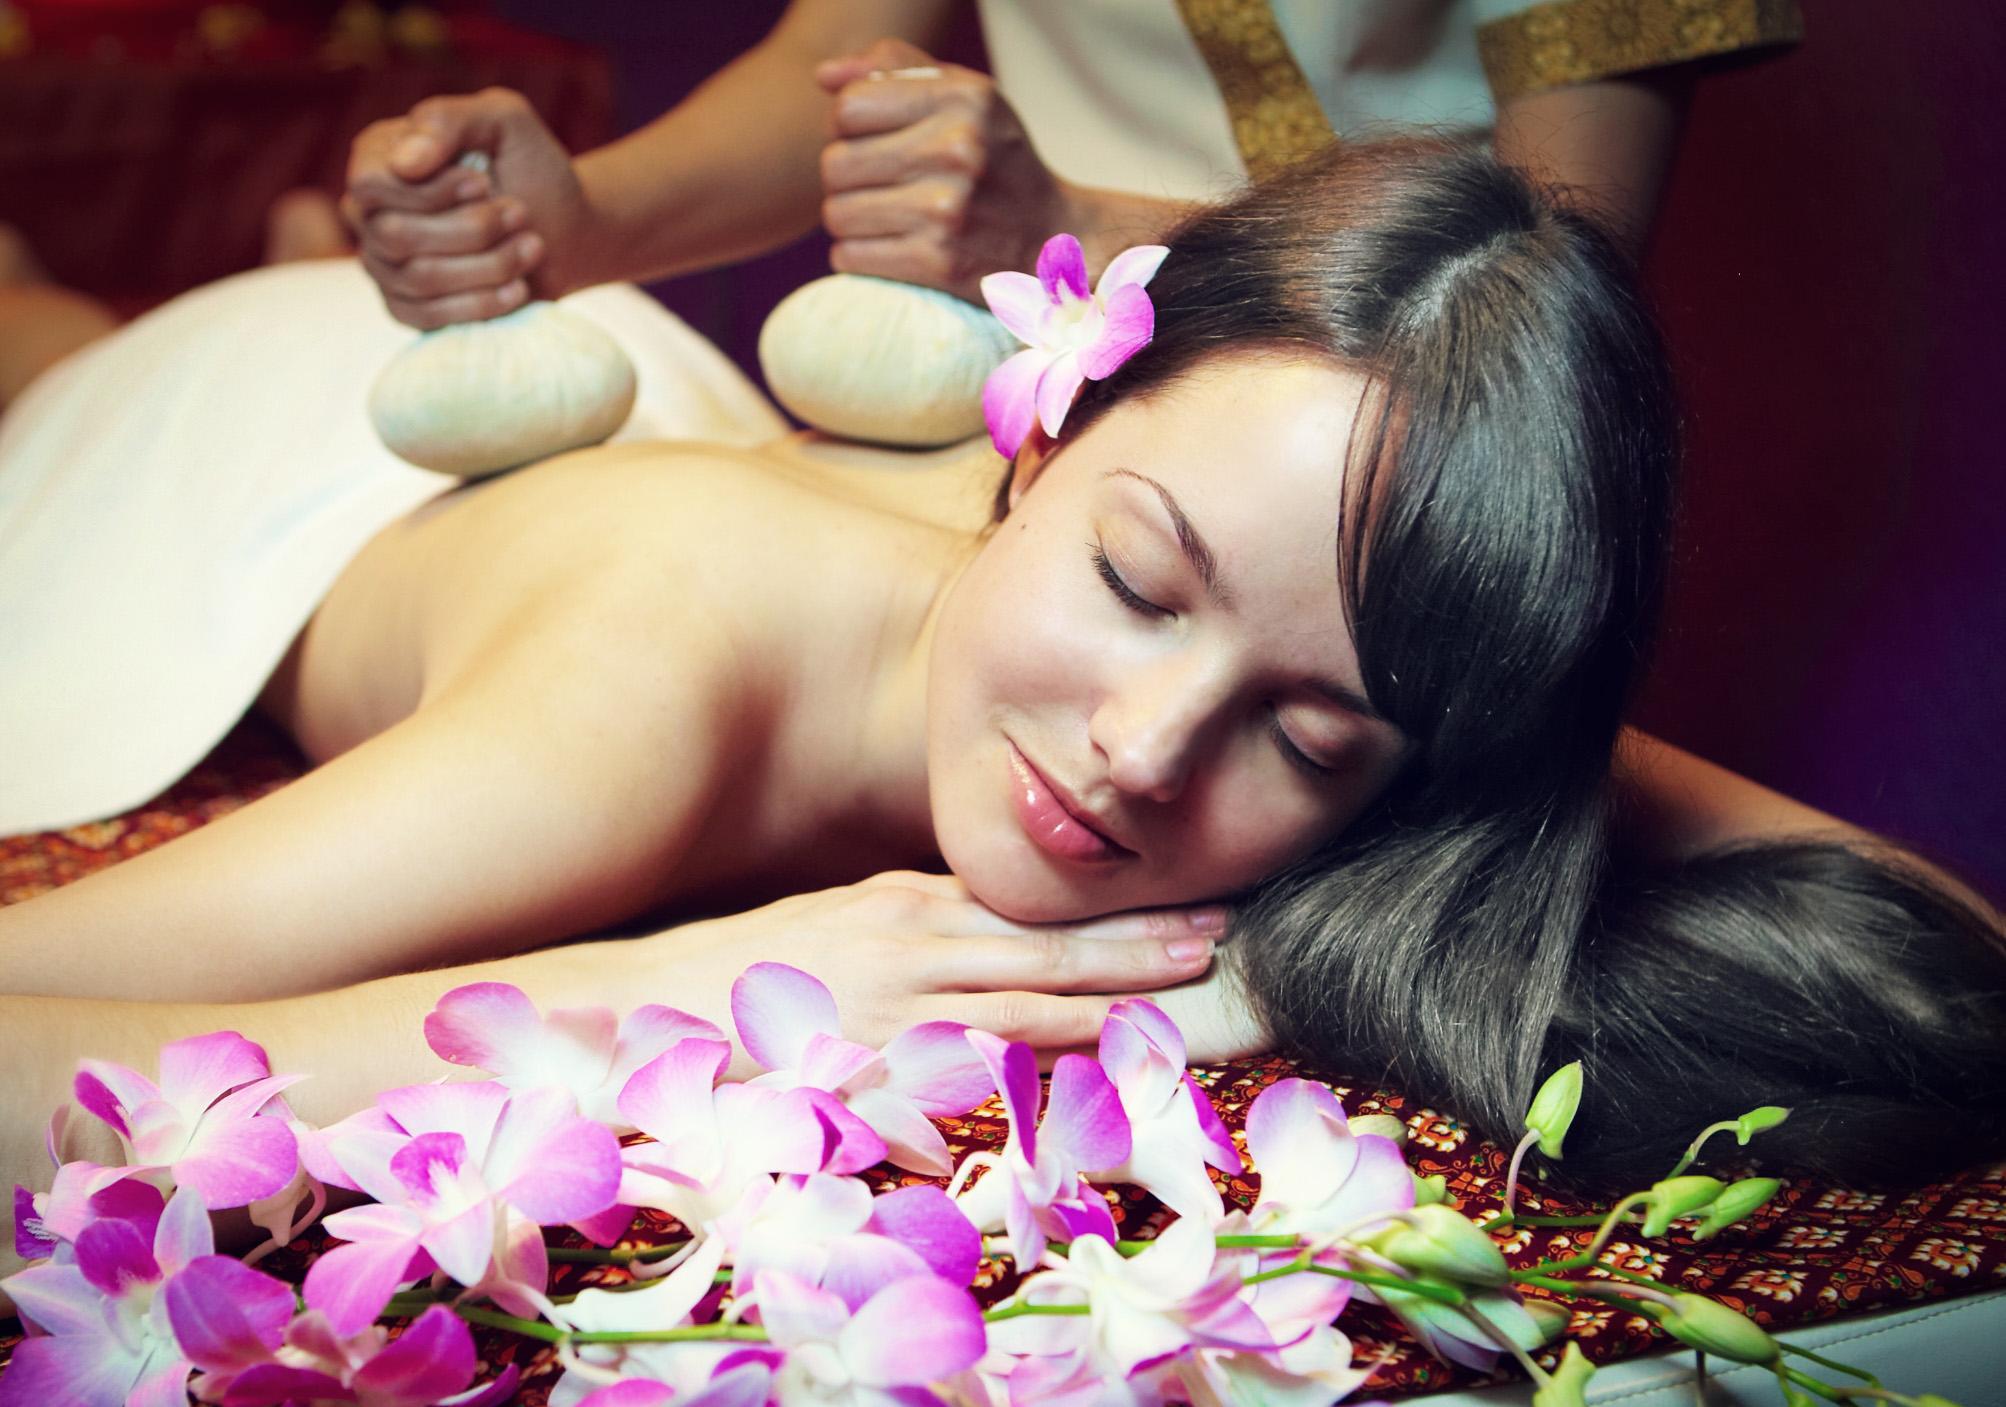 Райский массаж фото 6 фотография